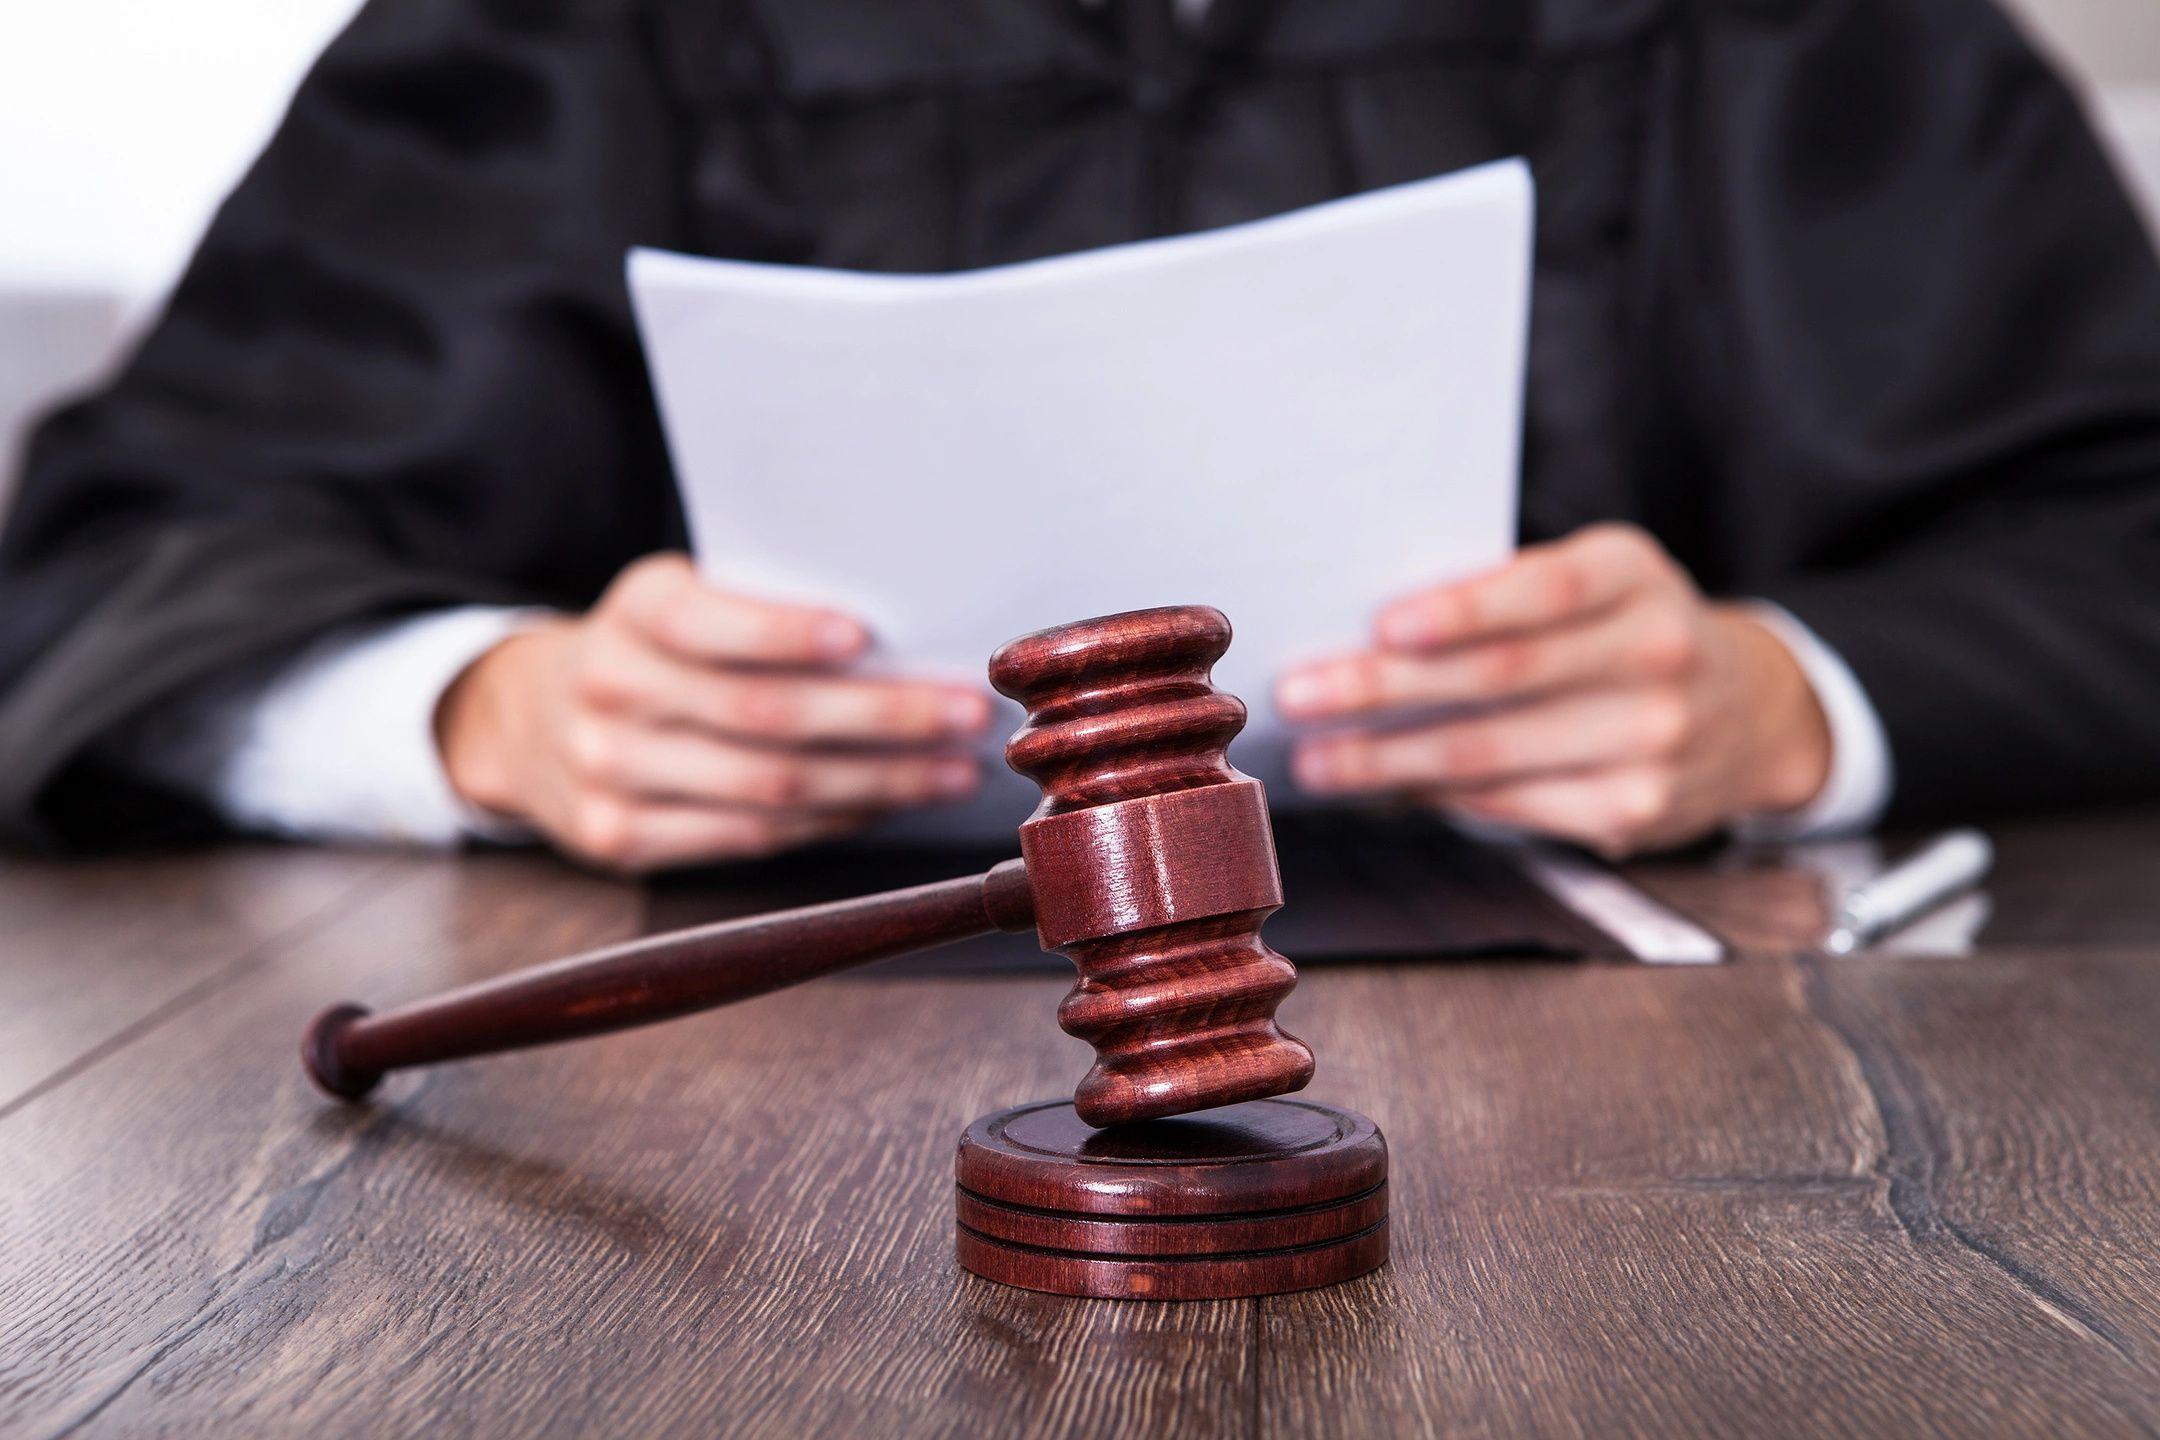 Fee Amnesty] Driver license reinstatement fee reduction